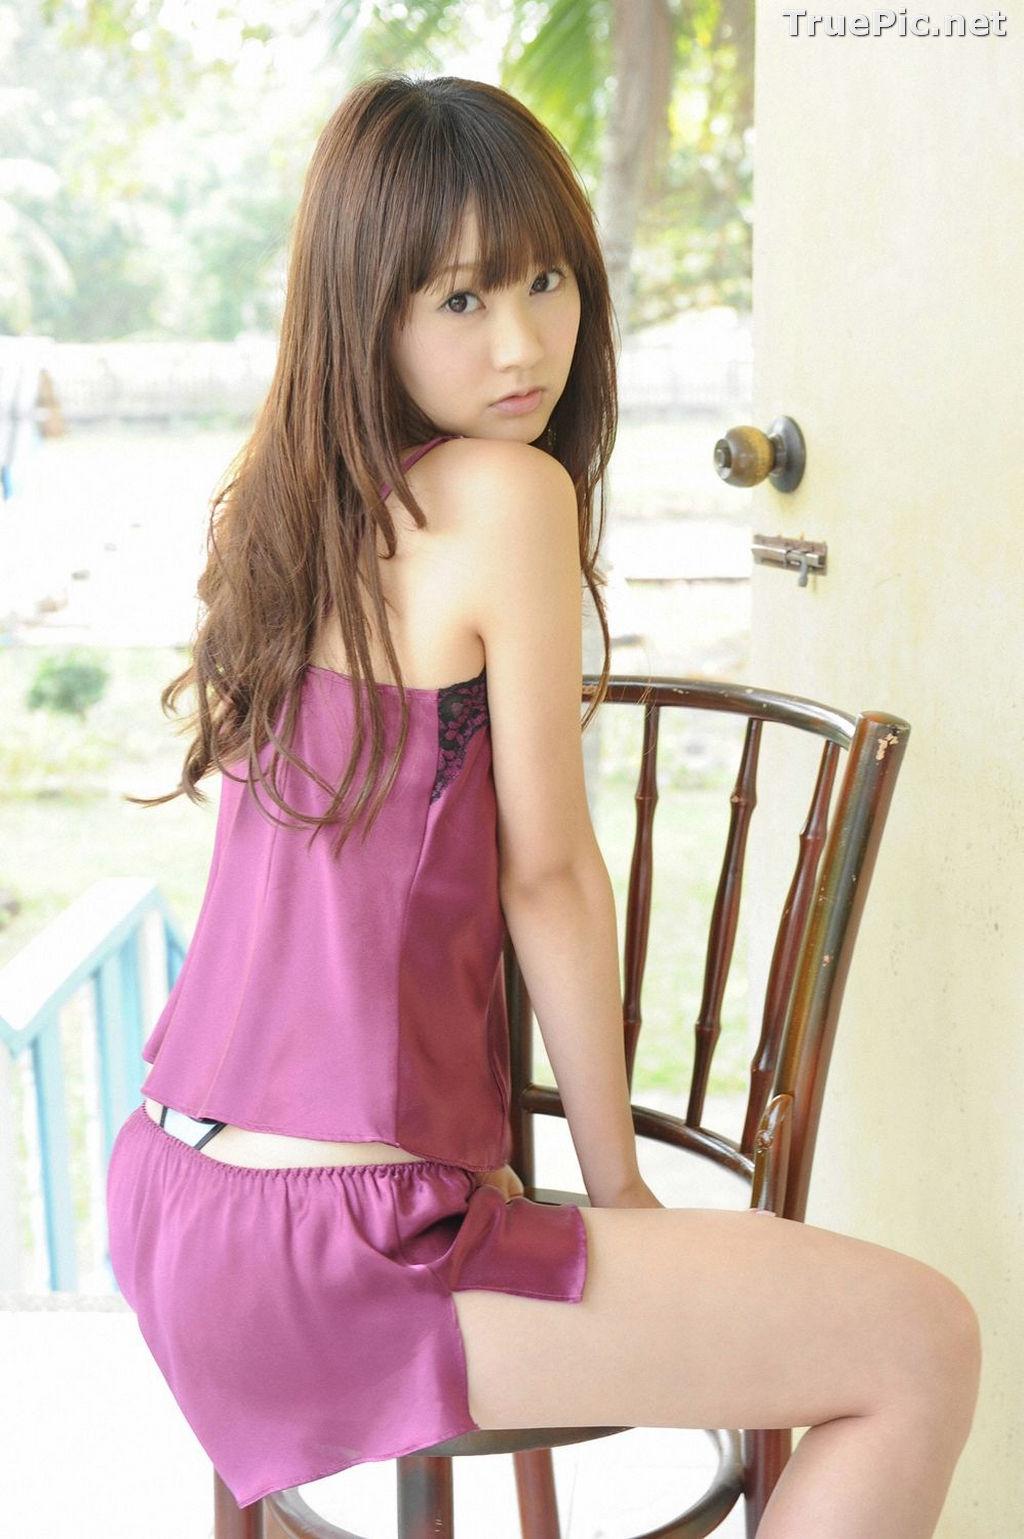 Image [YS Web] Vol.403 - Japanese Tarento and Gravure Idol - Hamada Shoko - TruePic.net - Picture-1